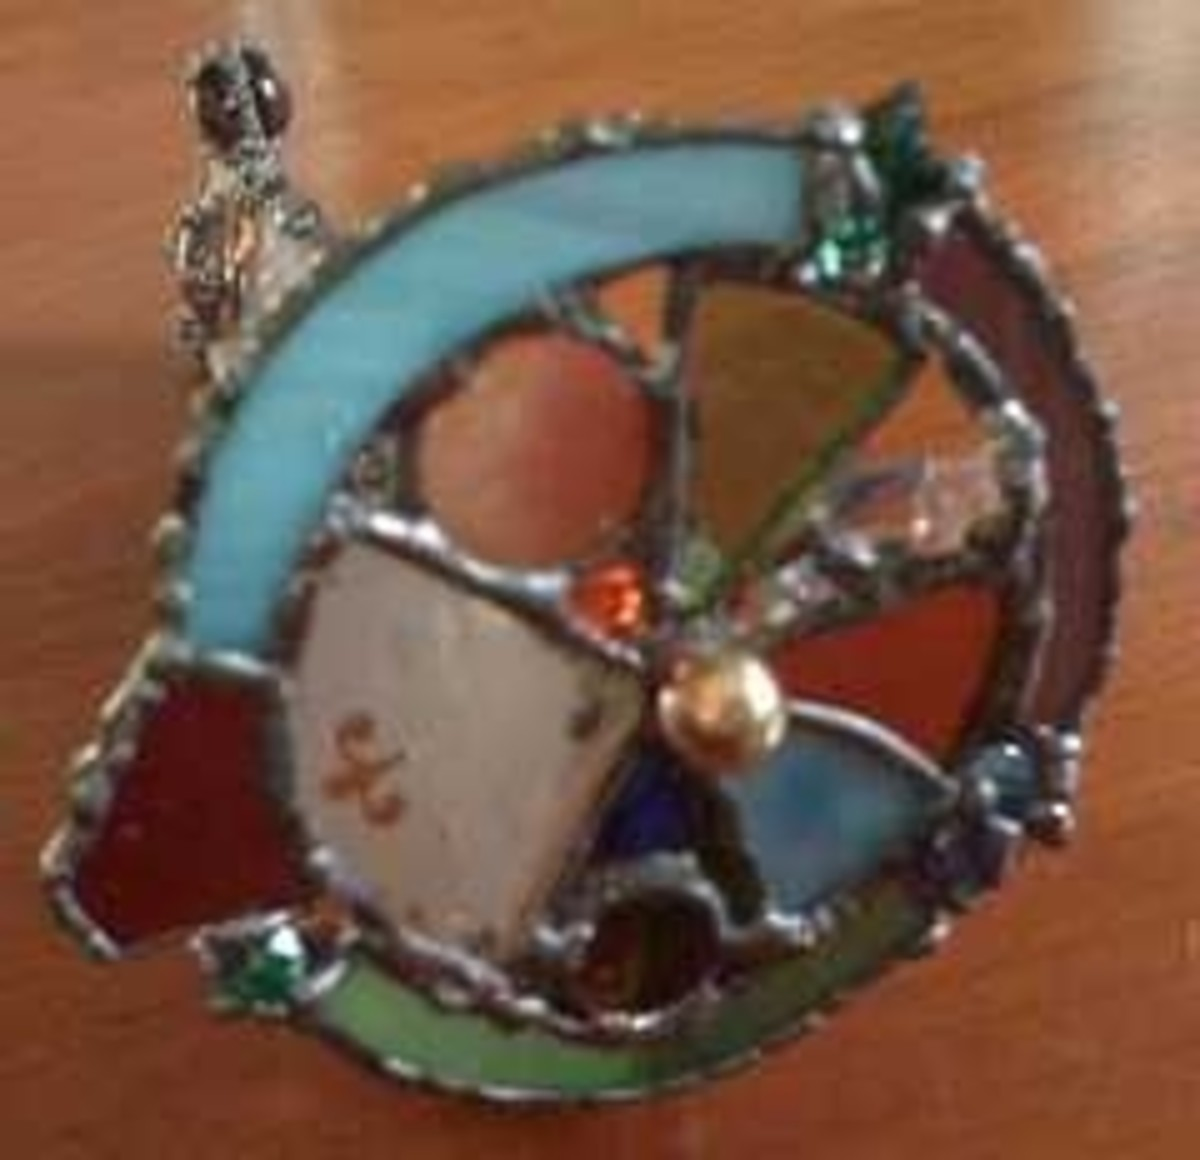 Stained glass kaleidoscope wheel